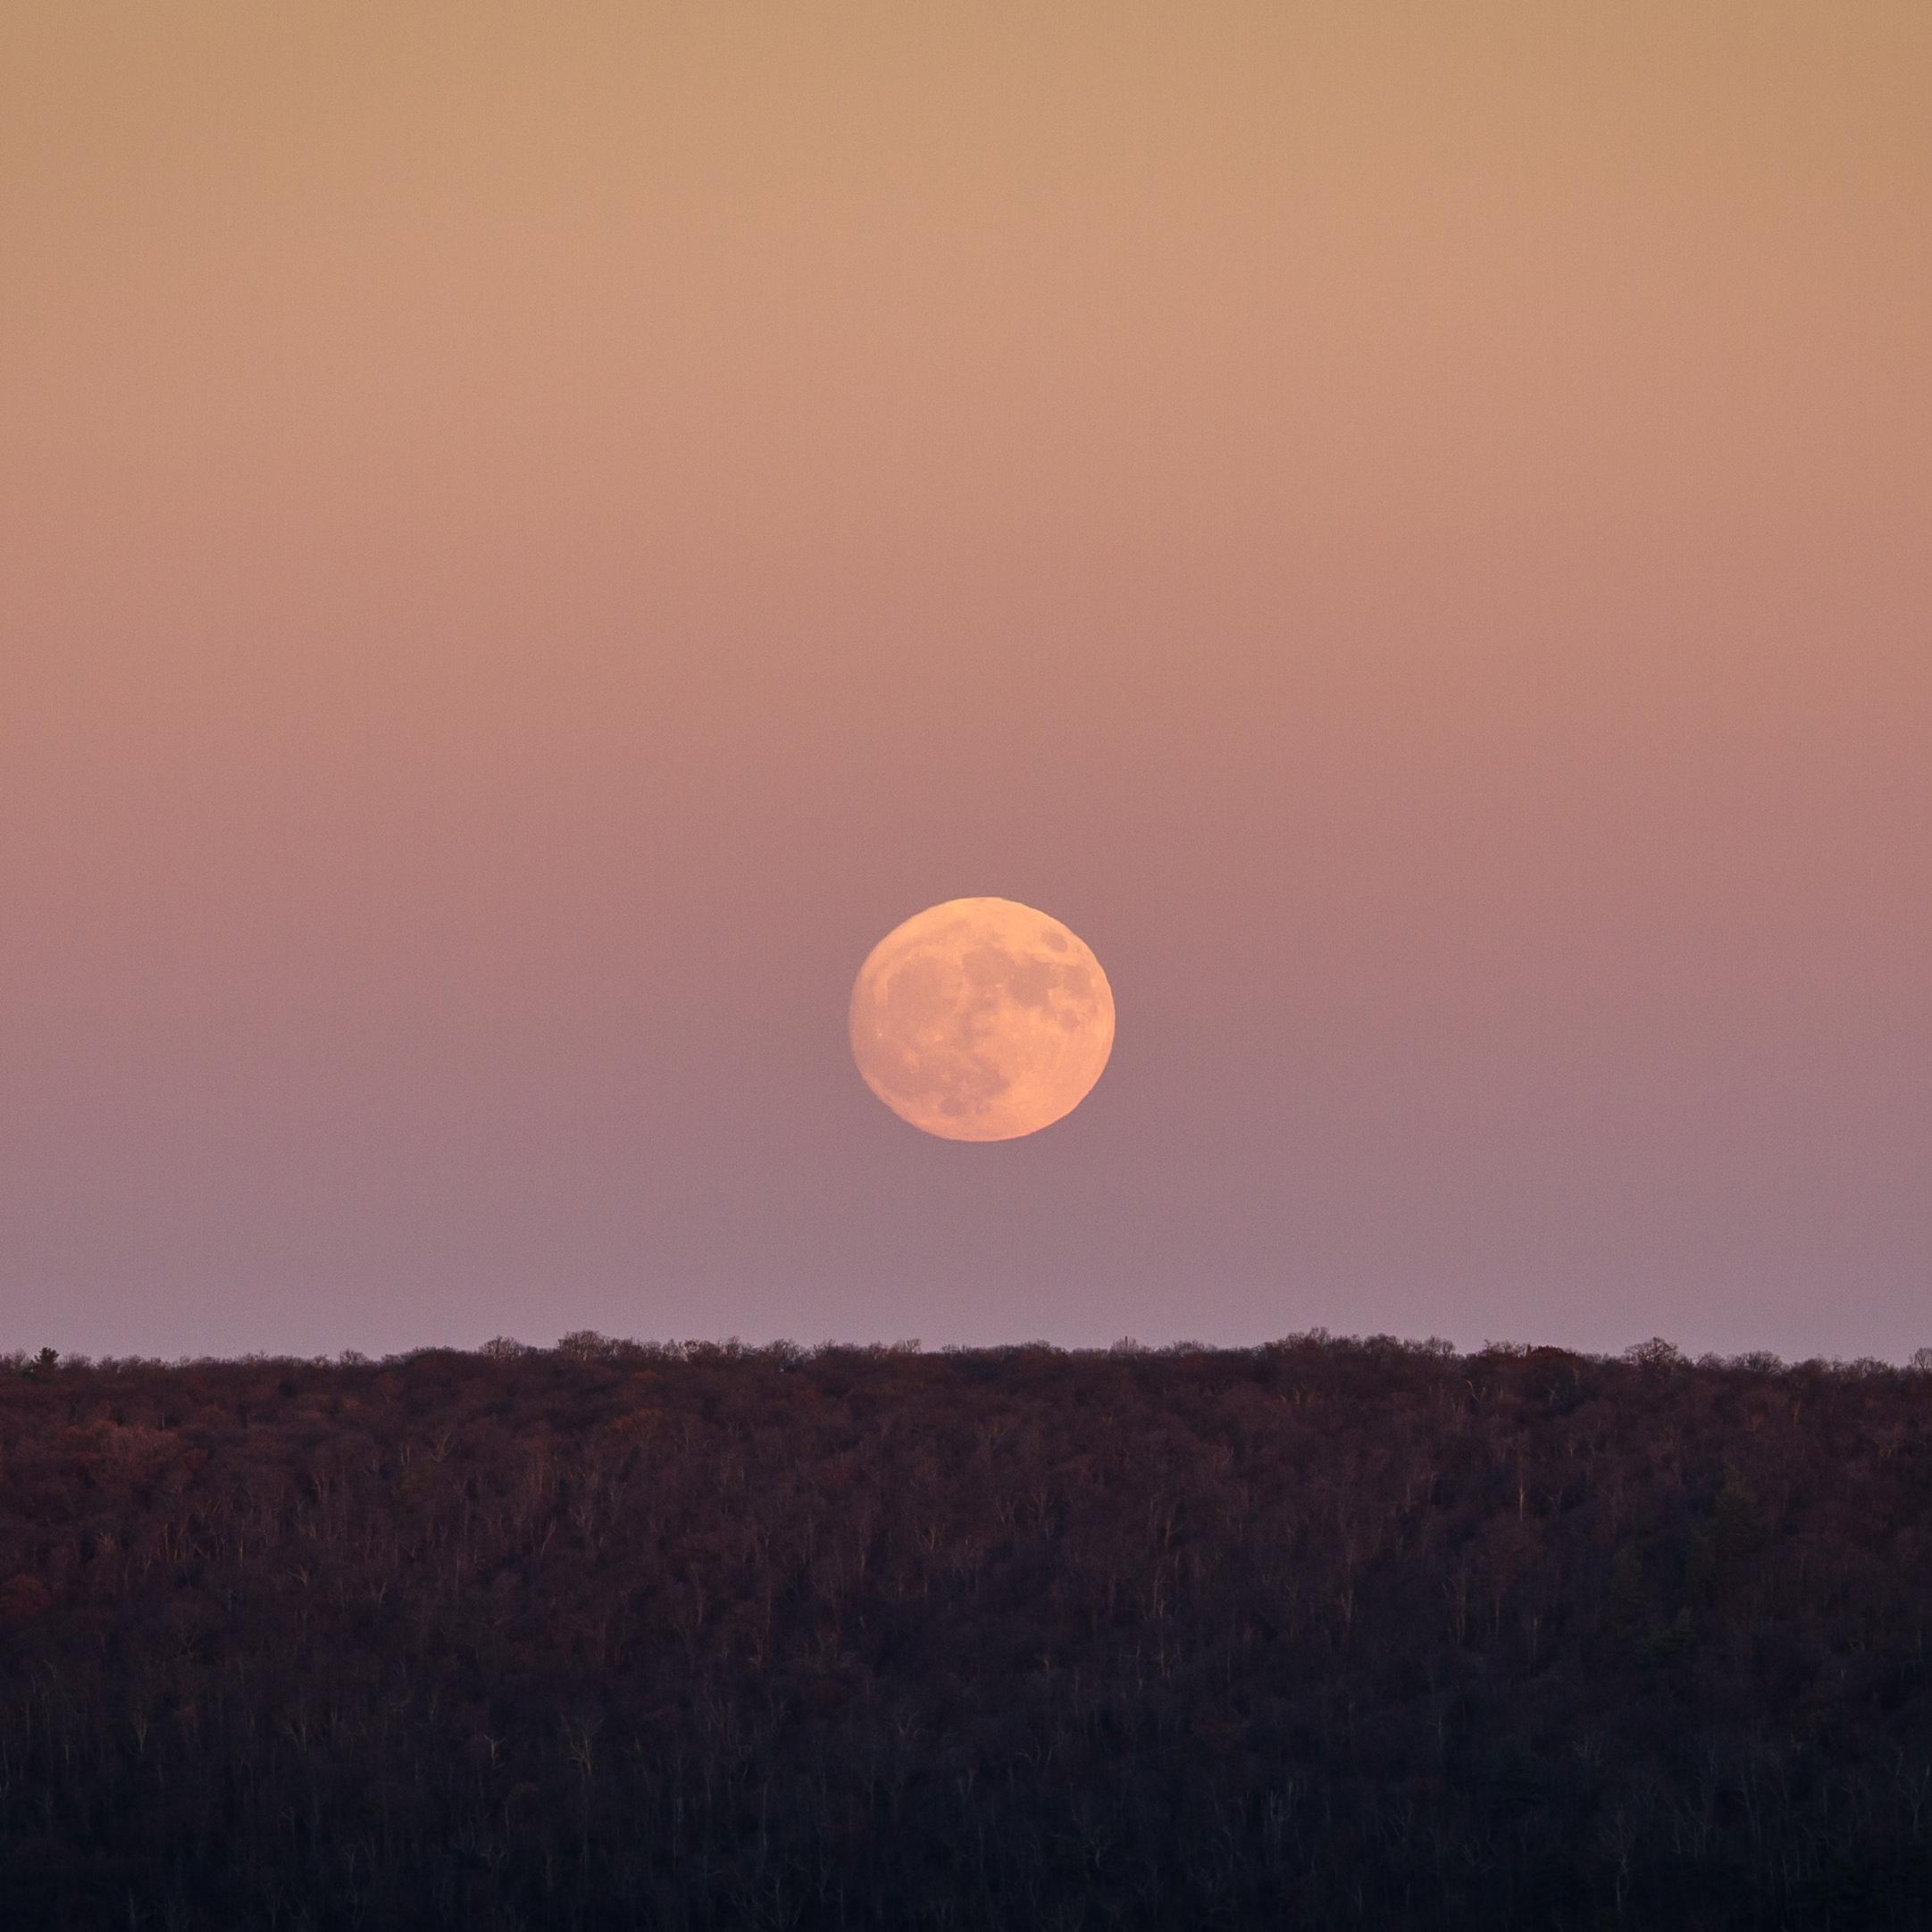 """Supermoon"" rise at Big Schloss peak, George Washington National Forest"